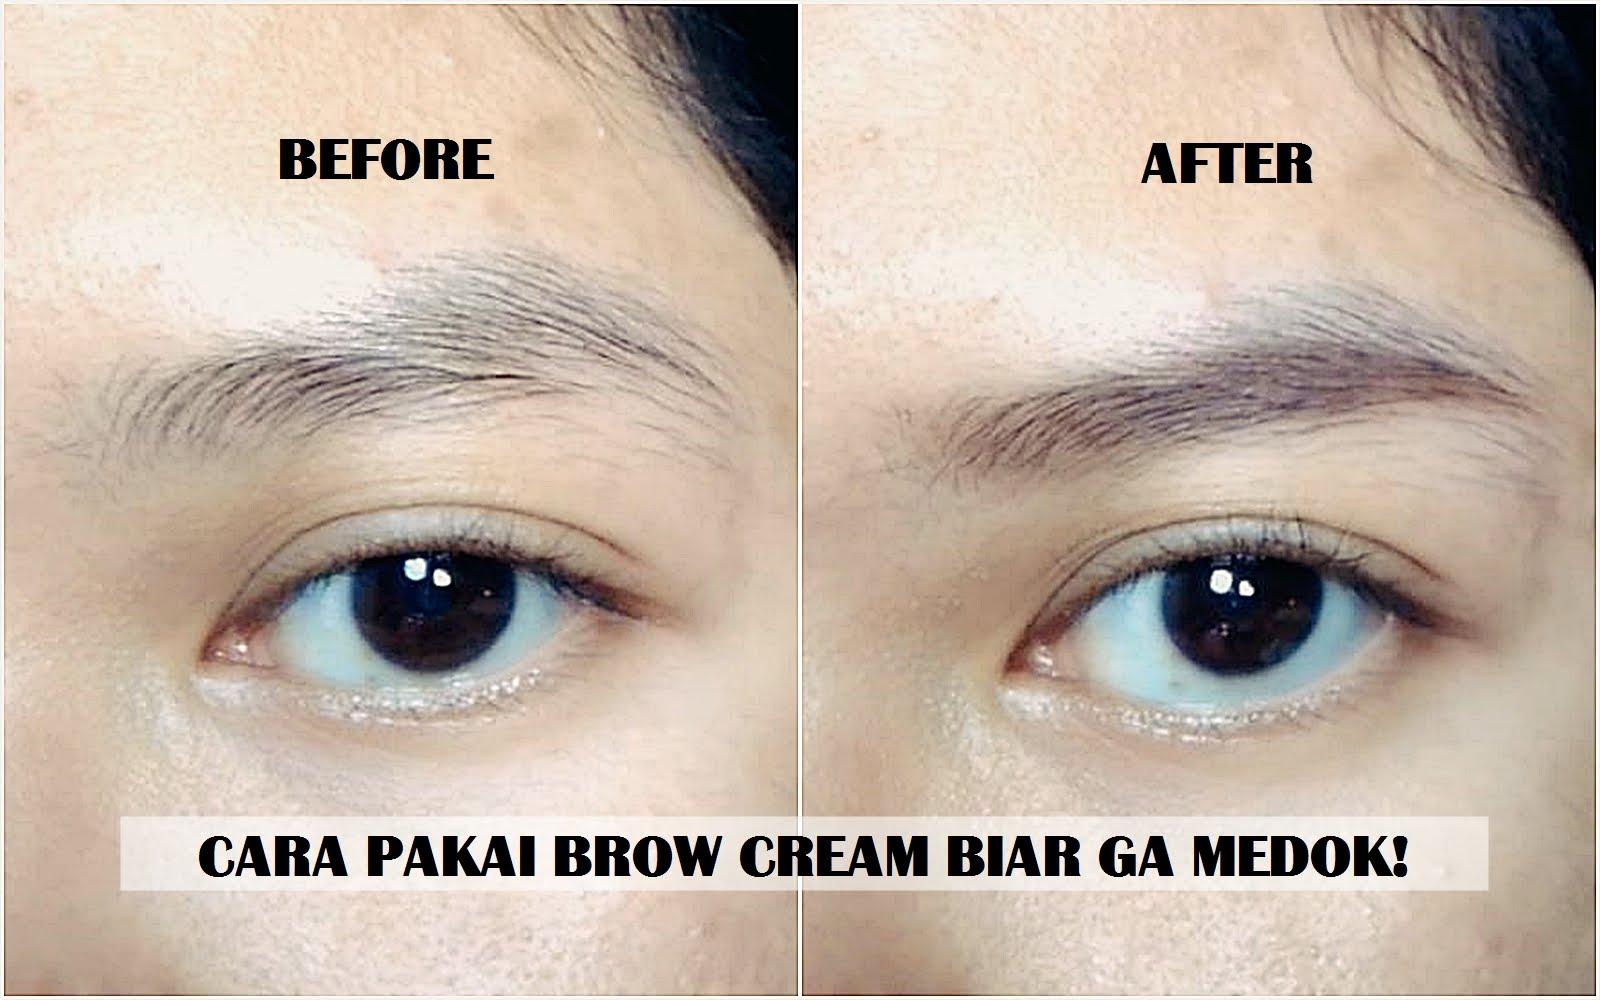 Tutorial Cara Pakai Eyebrow Cream Eyebrow Pomade Biar Ga Kayak Sinchan The Pretty Tales